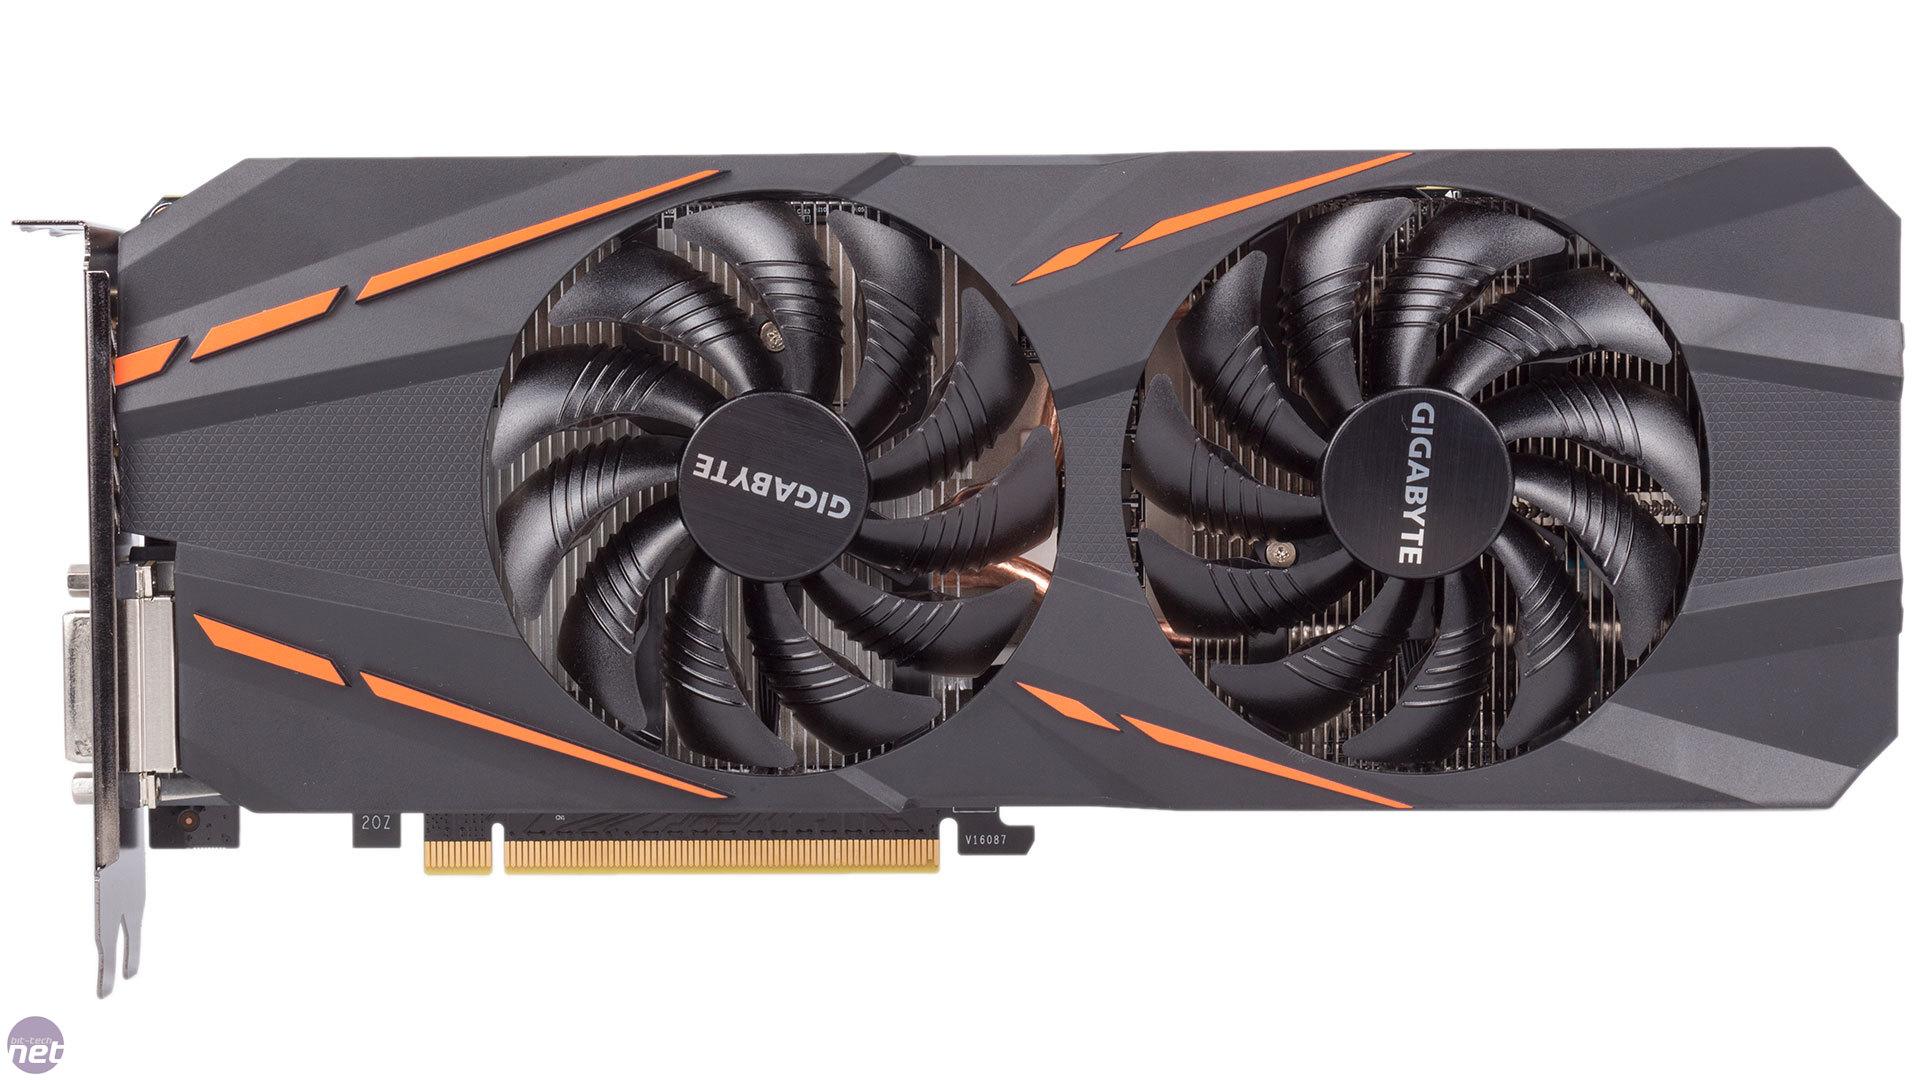 Gigabyte GeForce GTX 1060 G1 Gaming 6GB Review | bit-tech net